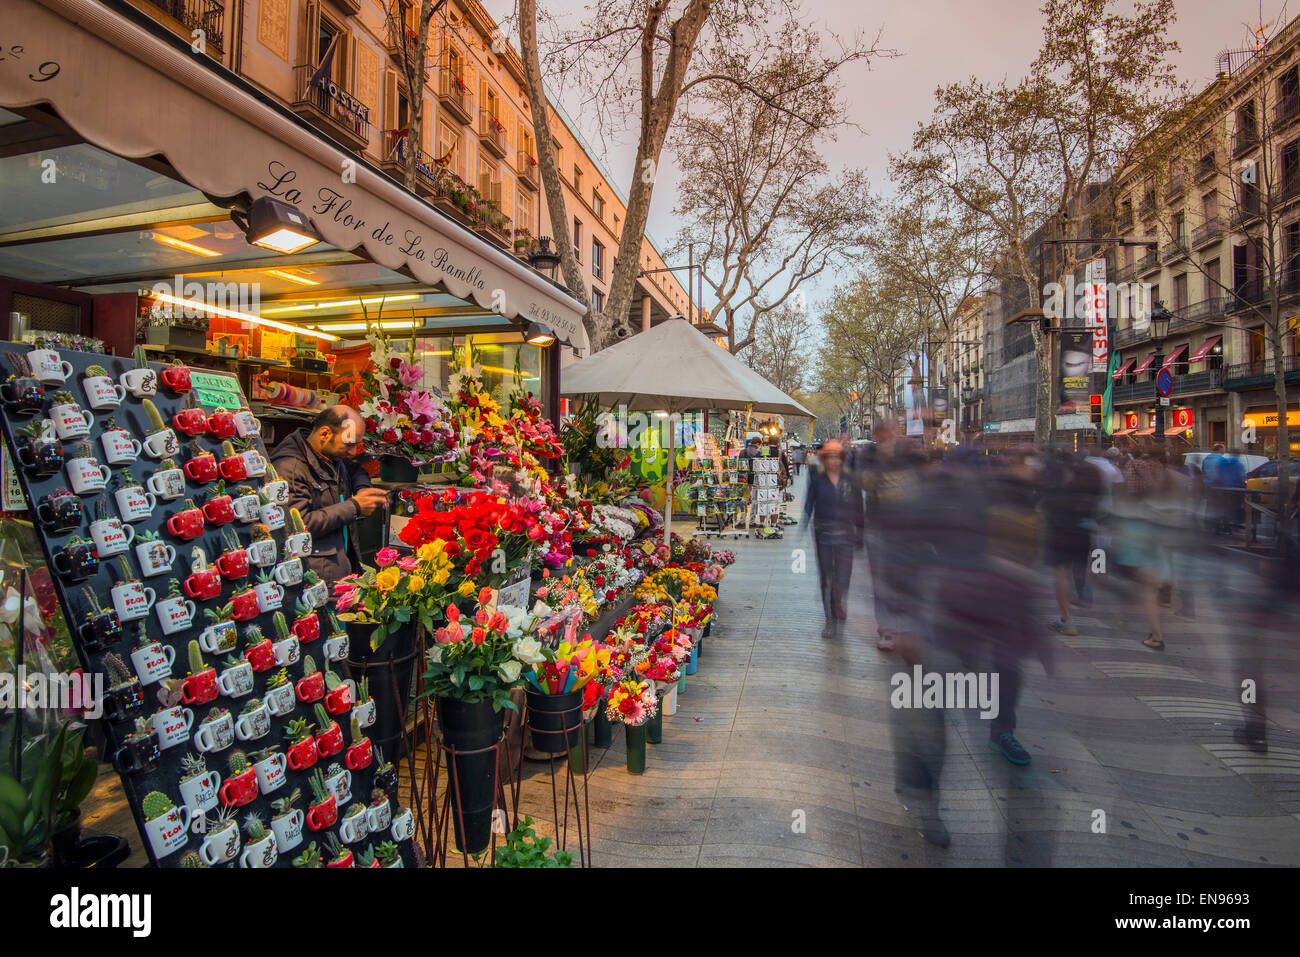 Florist's kiosk on La Rambla, Barcelona, Catalonia, Spain - Stock Image